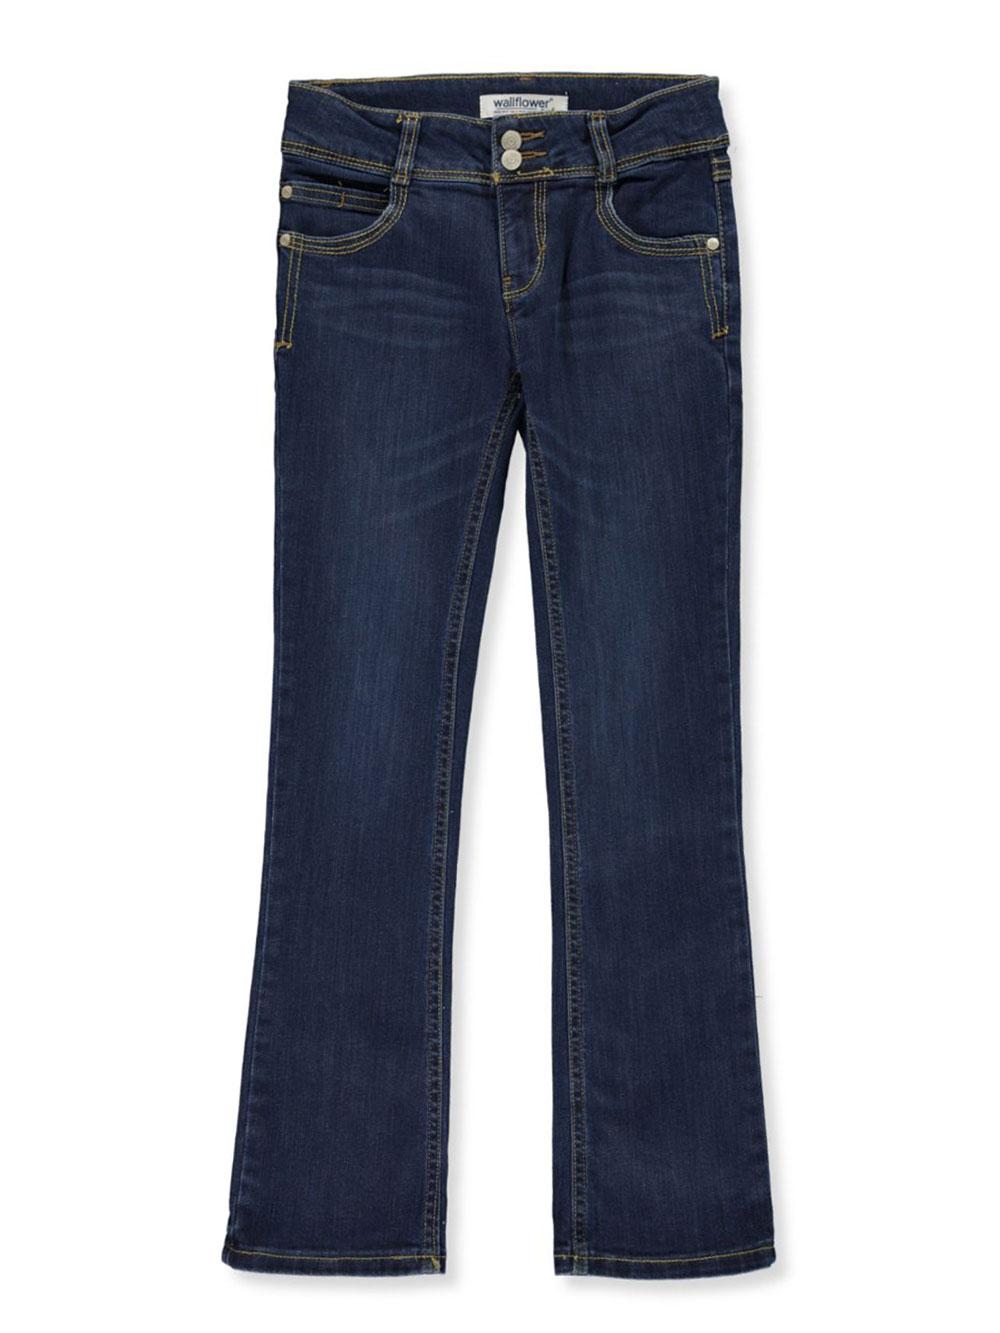 Girls Bootcut Jeans By Wallflower In Denim From Cookie S Kids